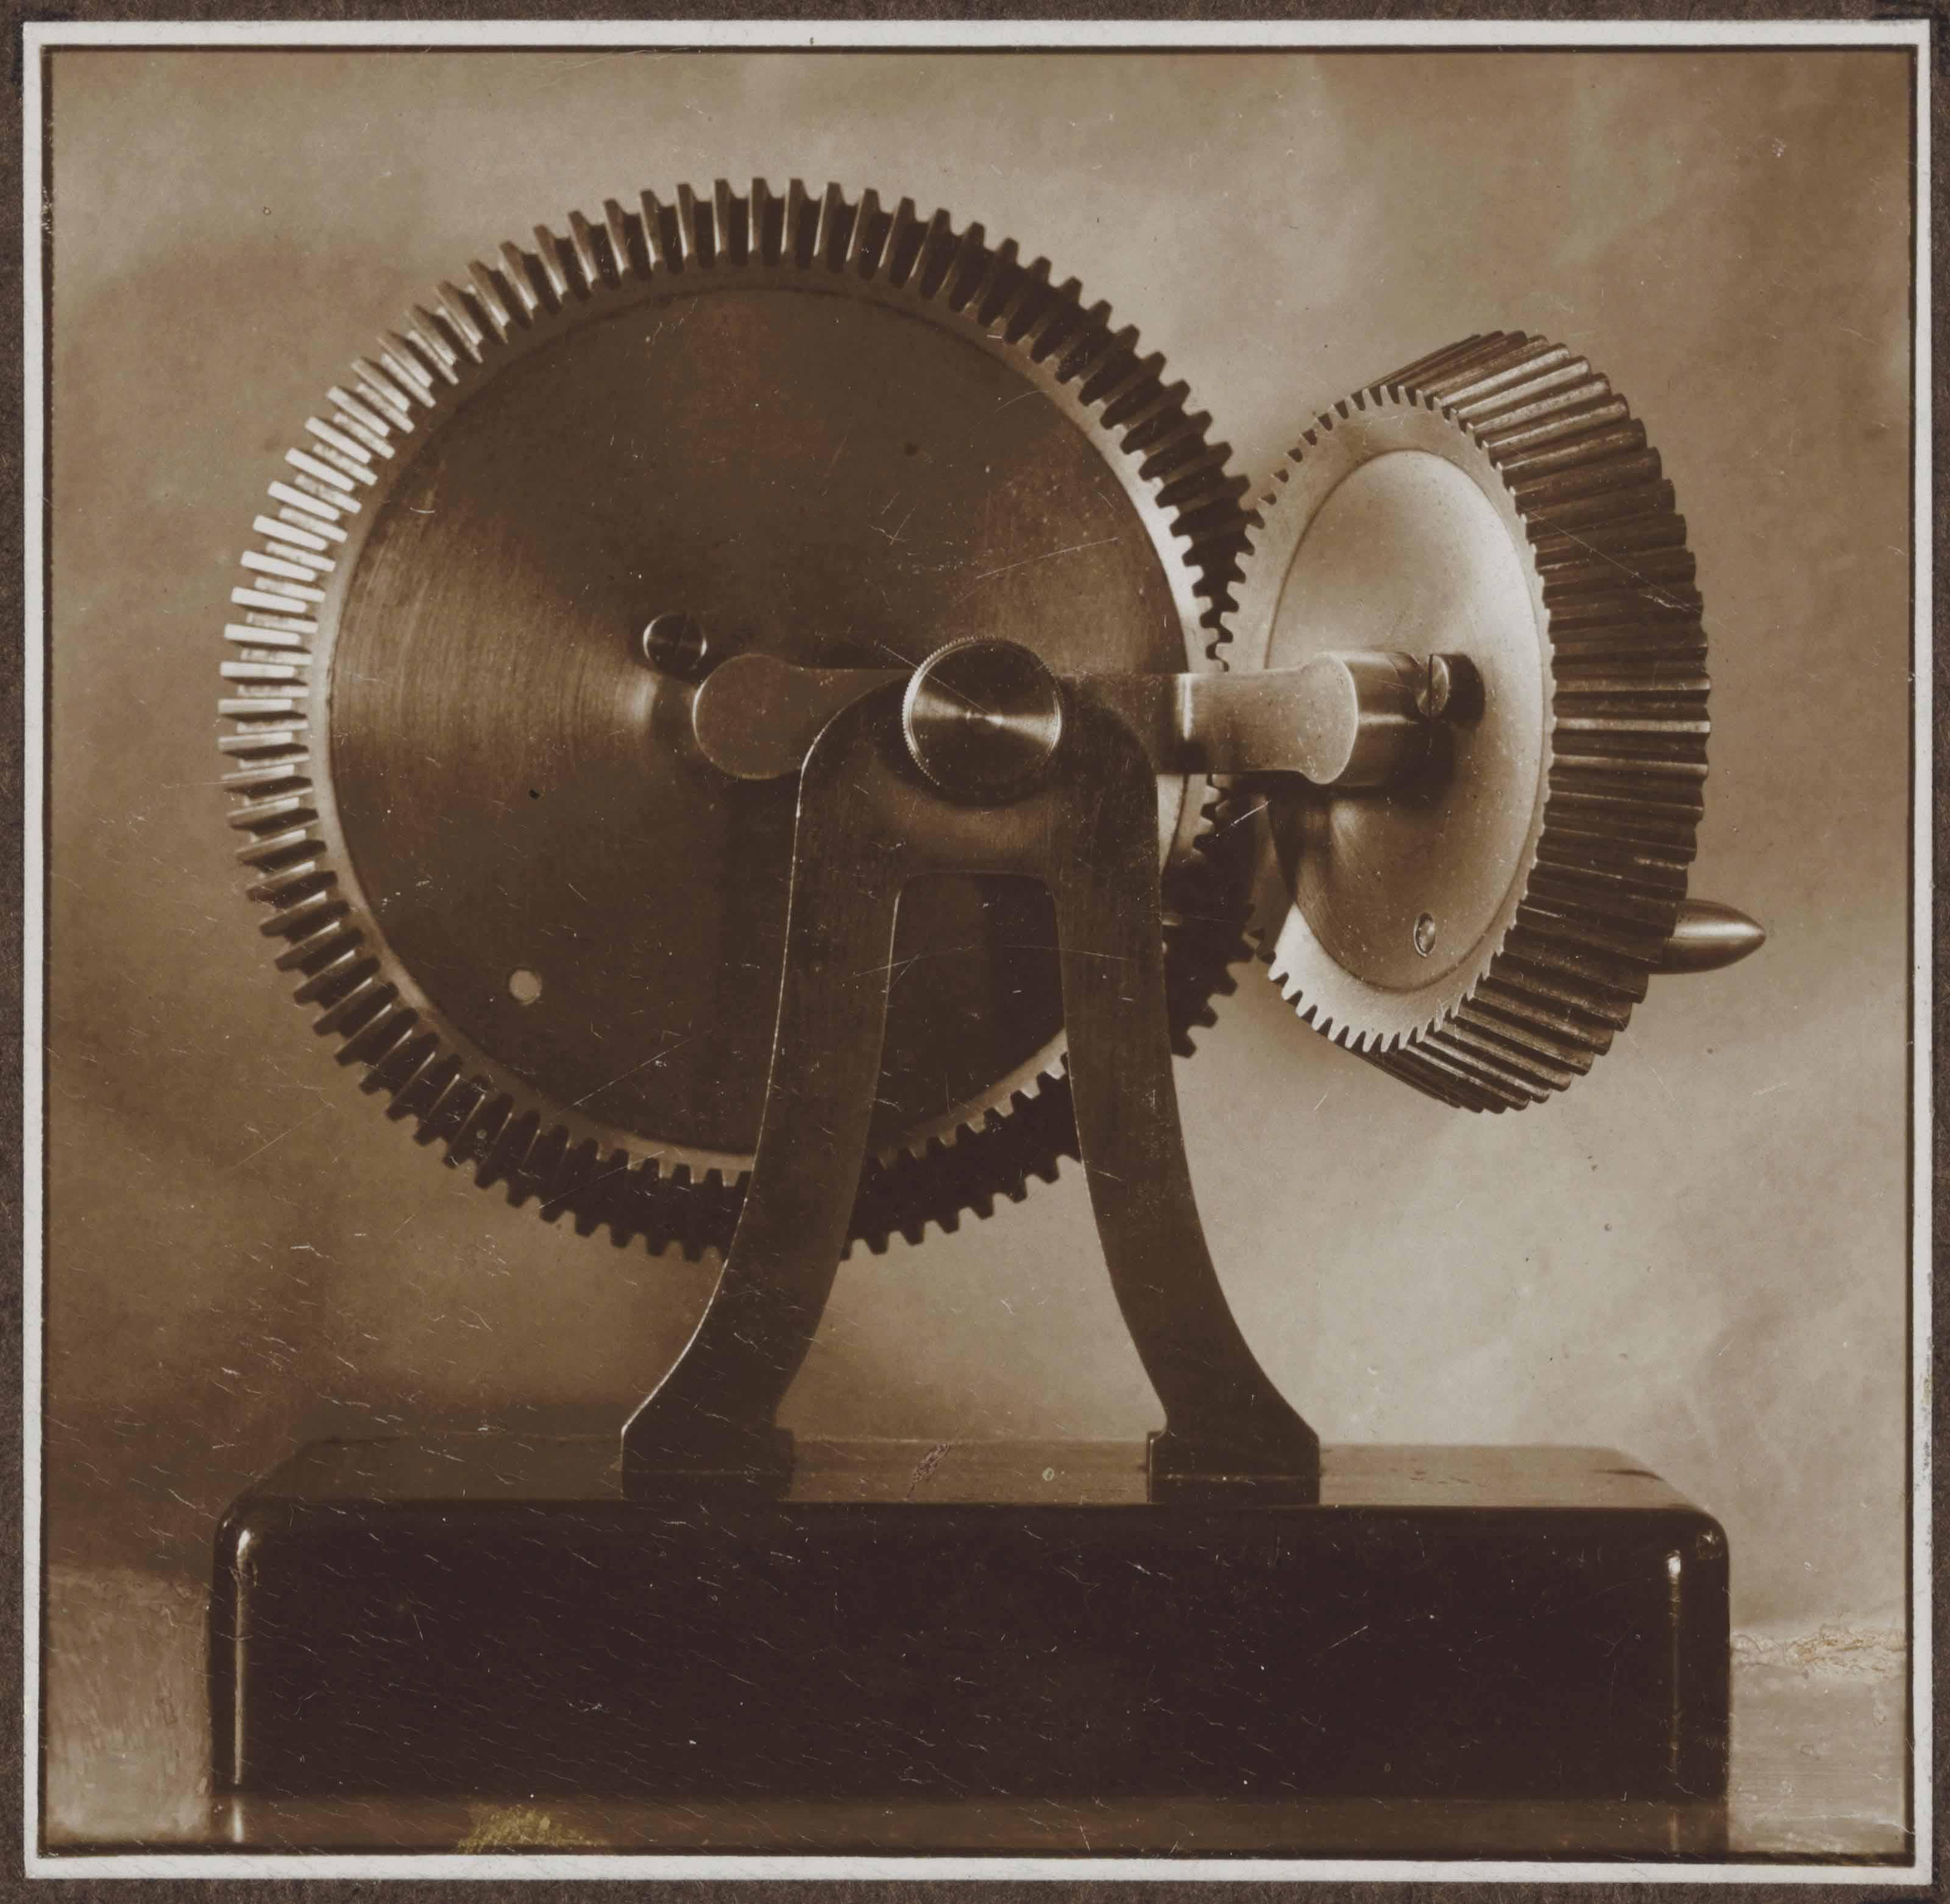 Untitled (Bevel Gears), 1923